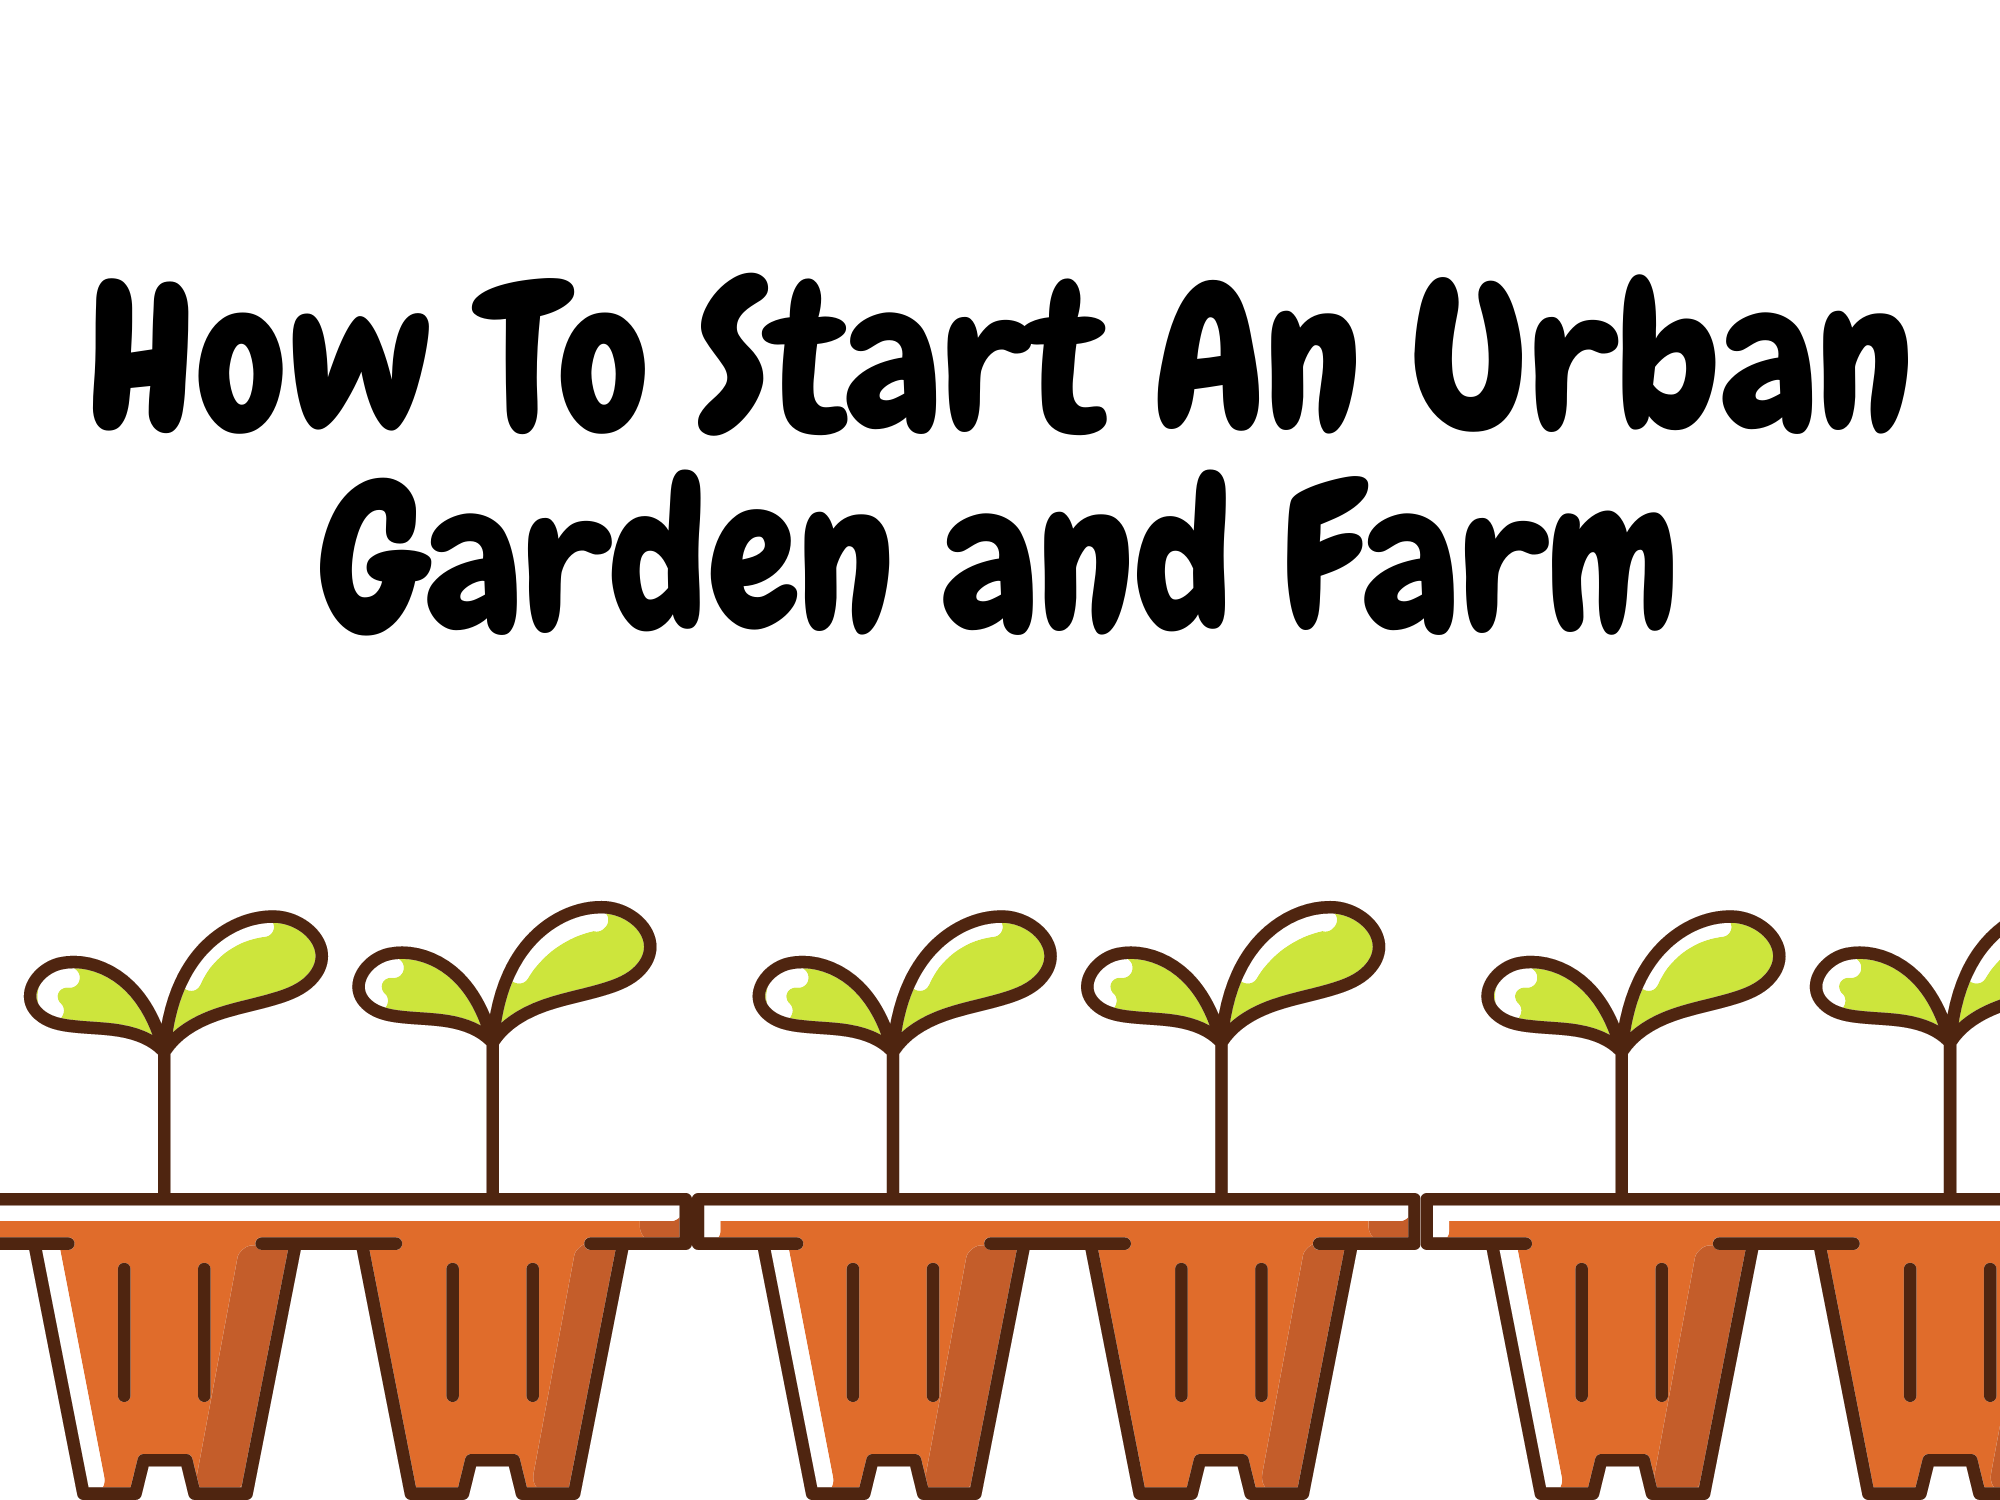 How-To-Start-An-Urban-Garden-and-Farm